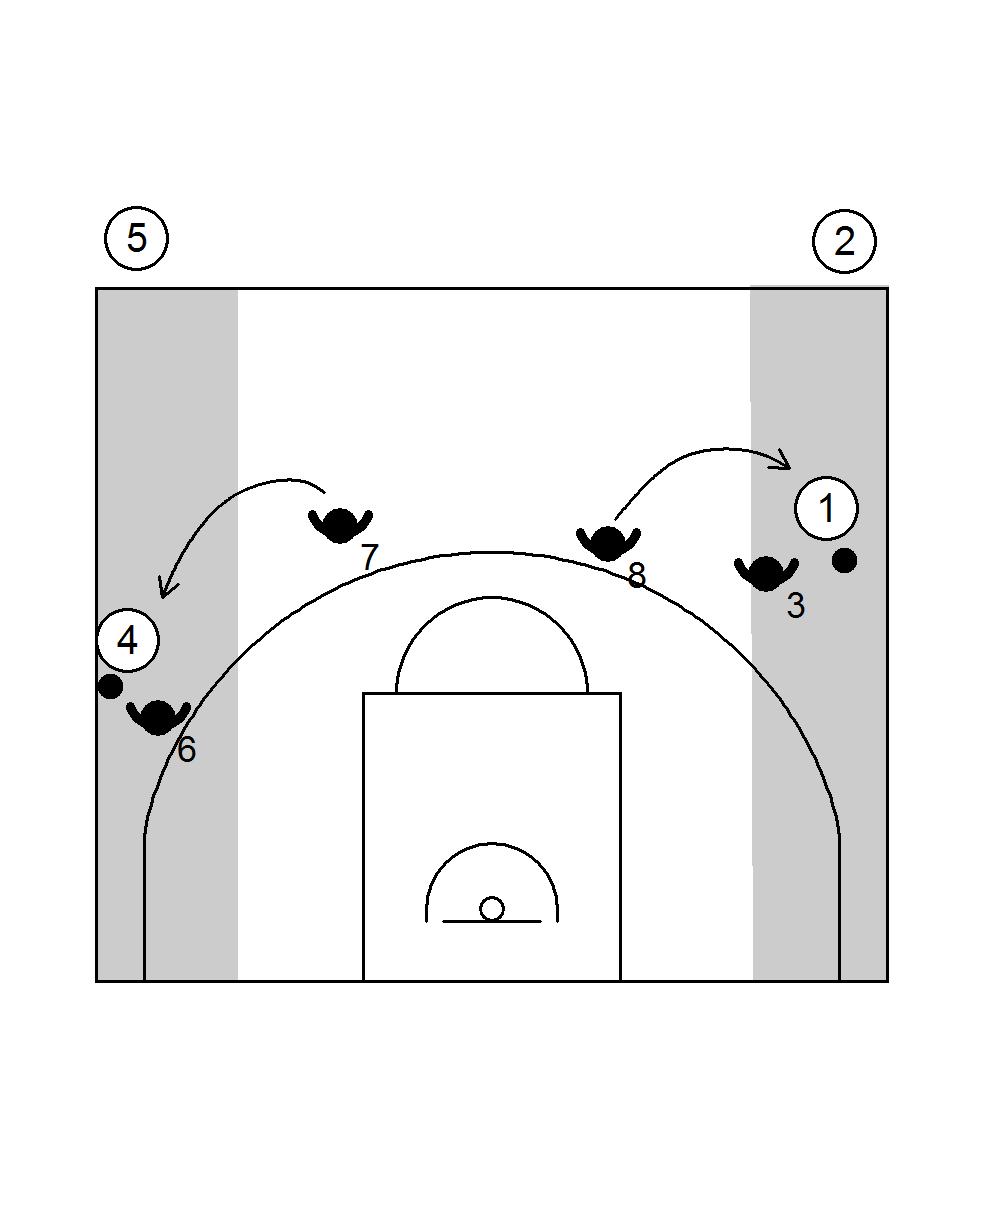 dribbelaar-lane-double-team